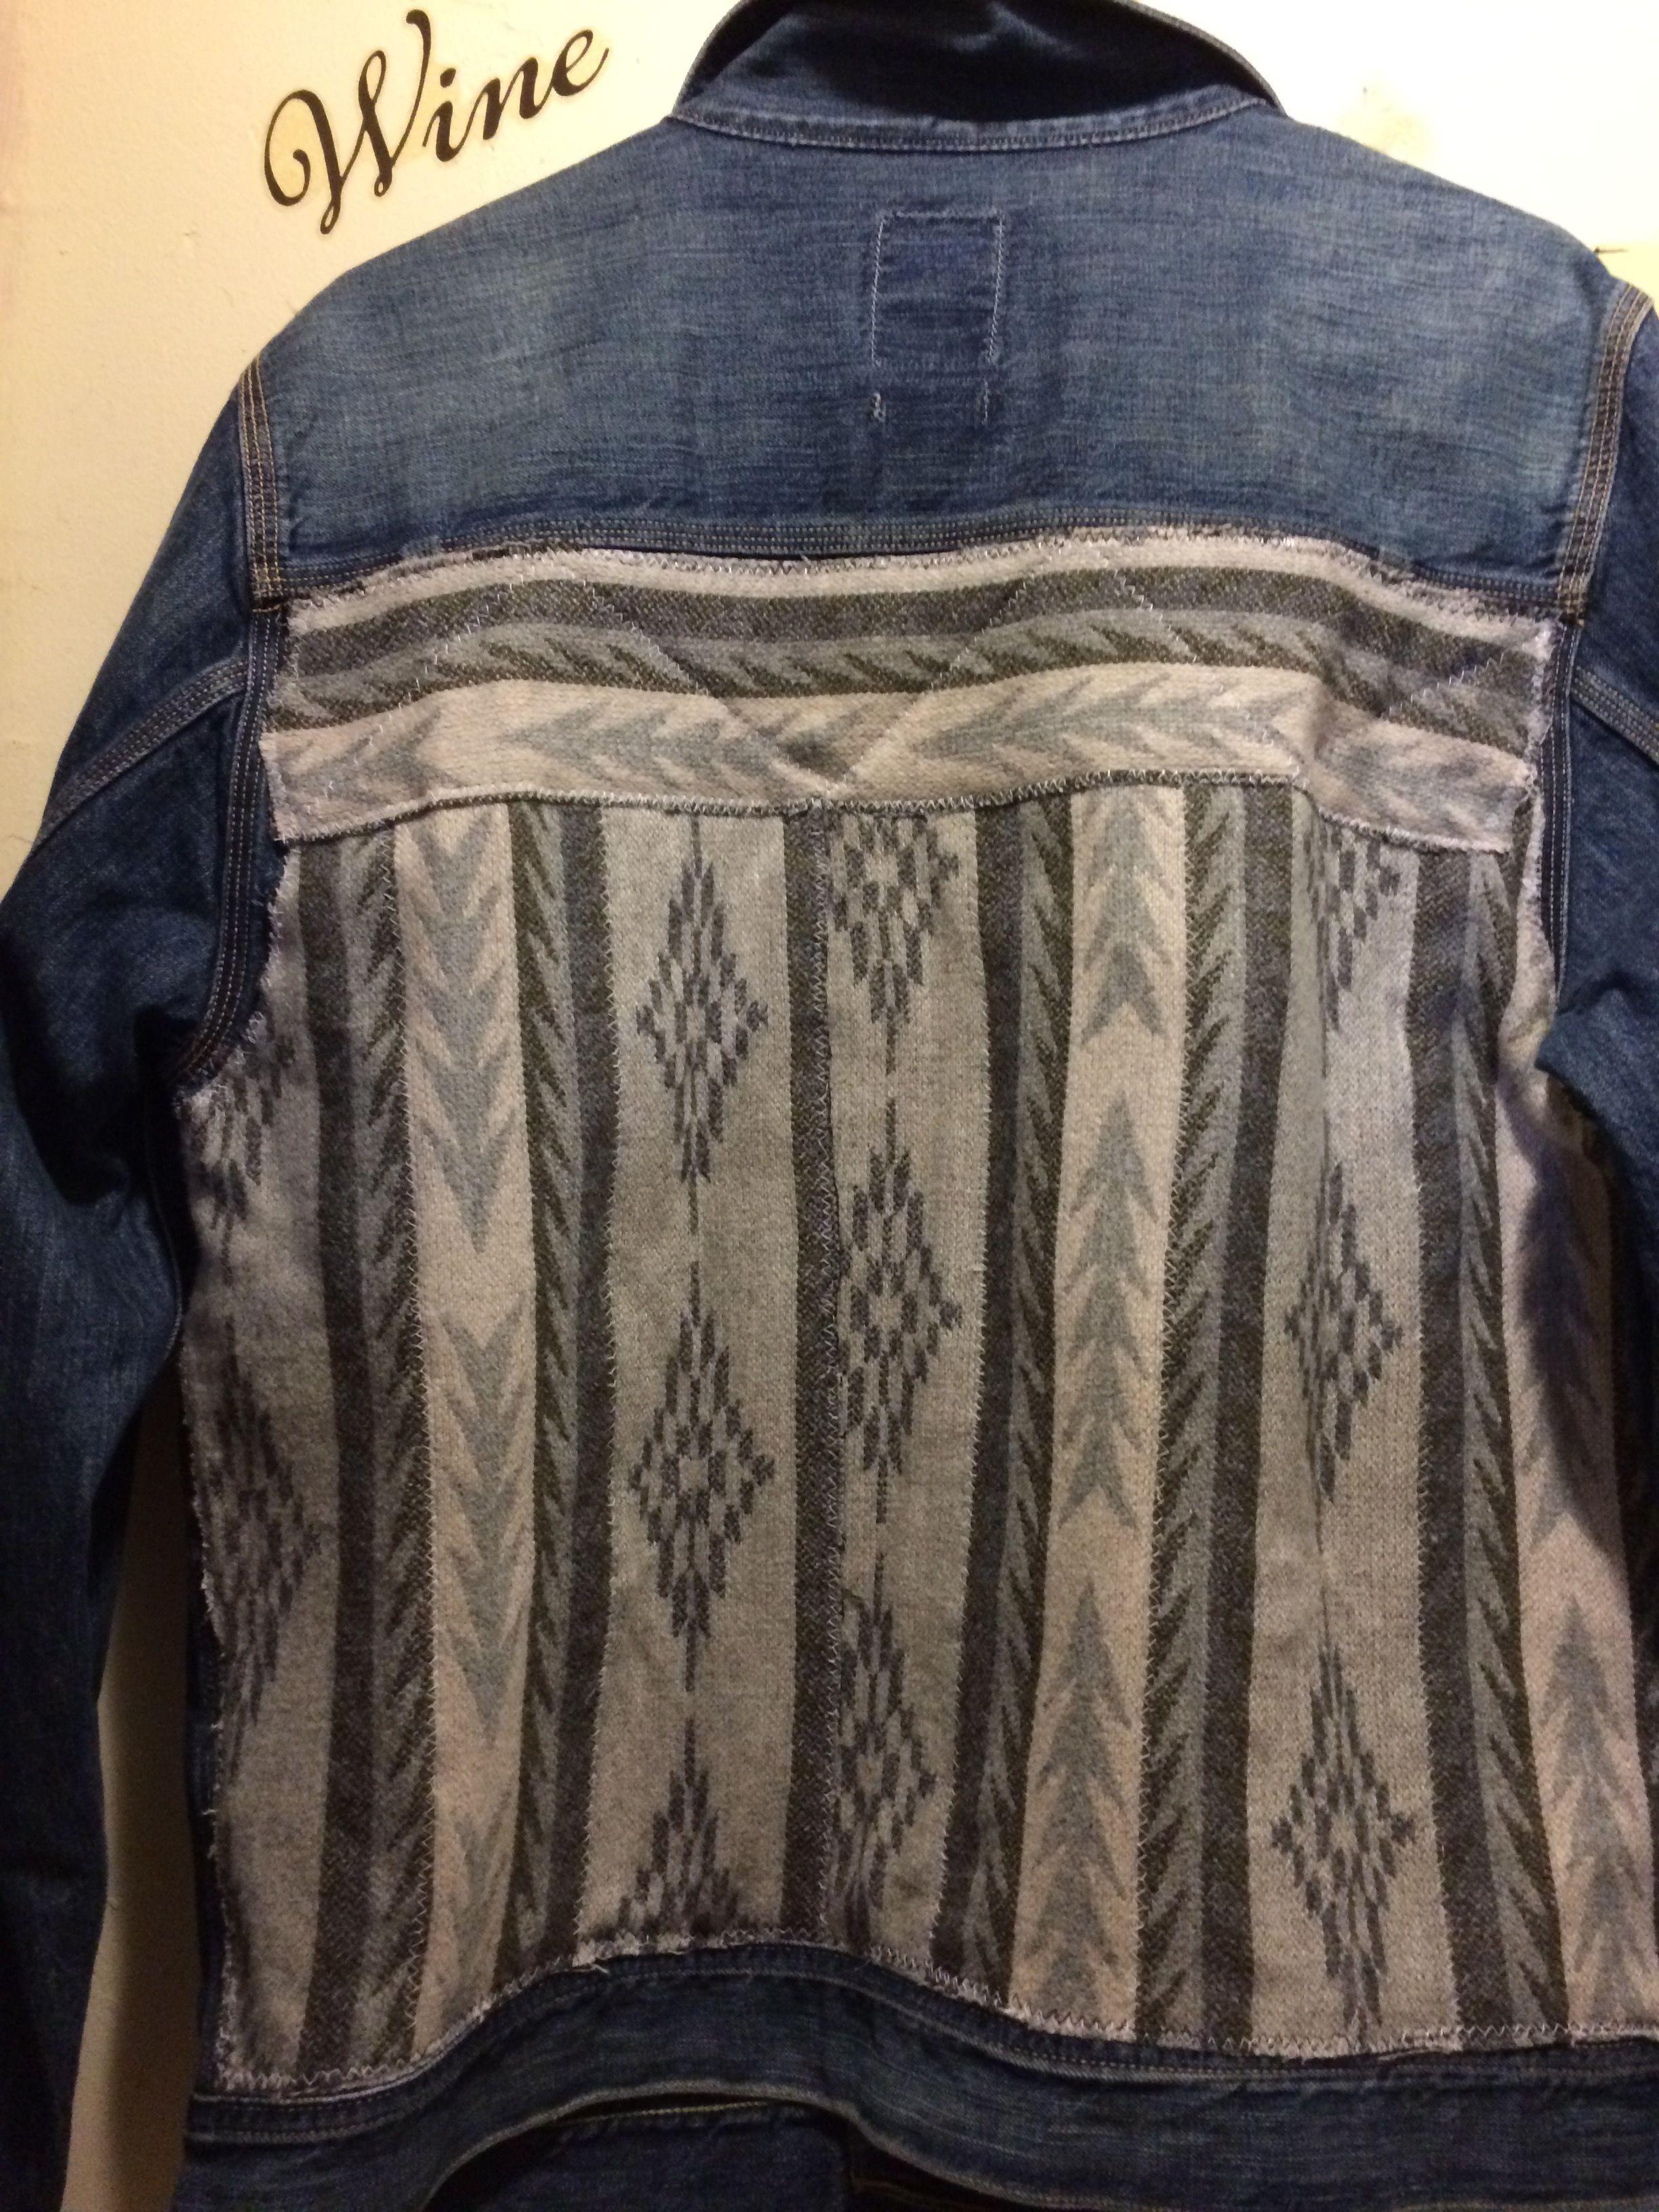 Mens jeans design legends jeans - Up Cycled Vintage Lucky Brand Legend Men S Jacket With Southwest Blanket Fabric